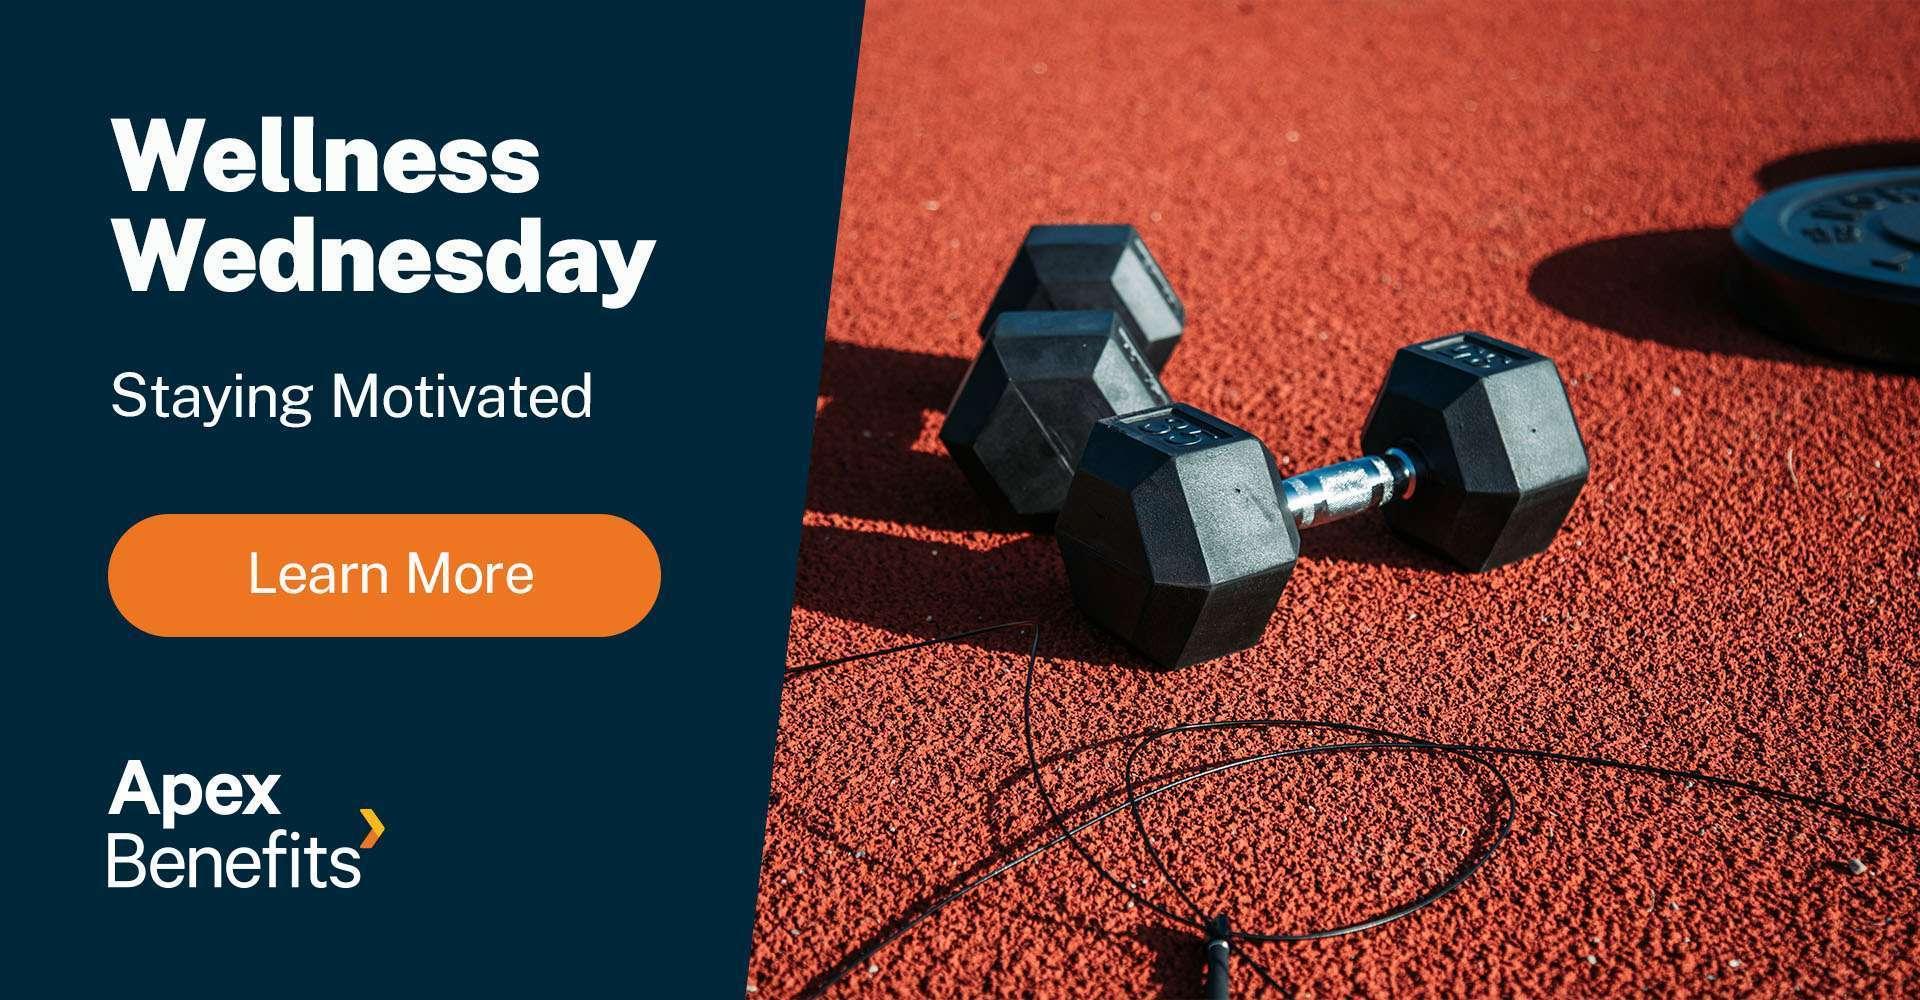 Wellness Wednesday: Staying Motivated